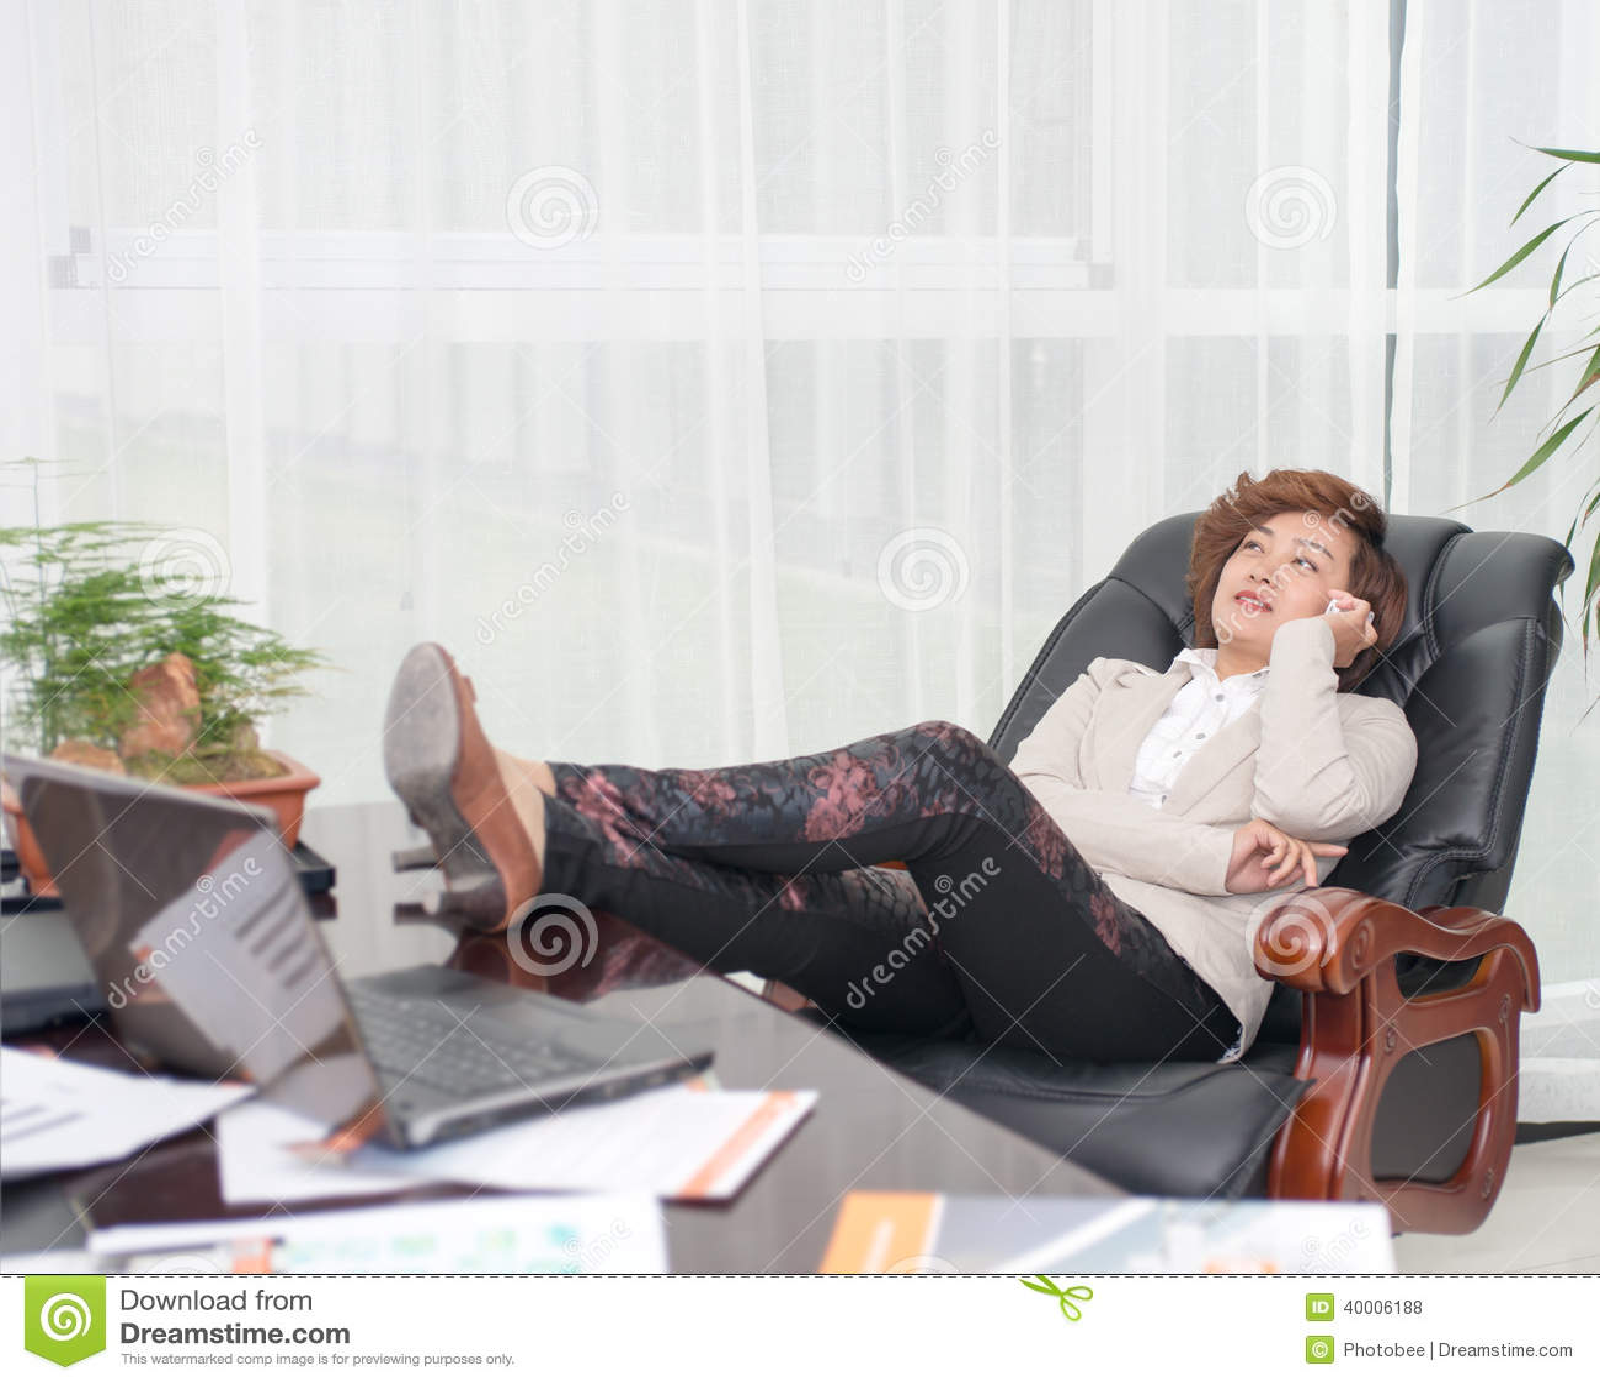 Relax Female Boss Stock Photo Image 40006188